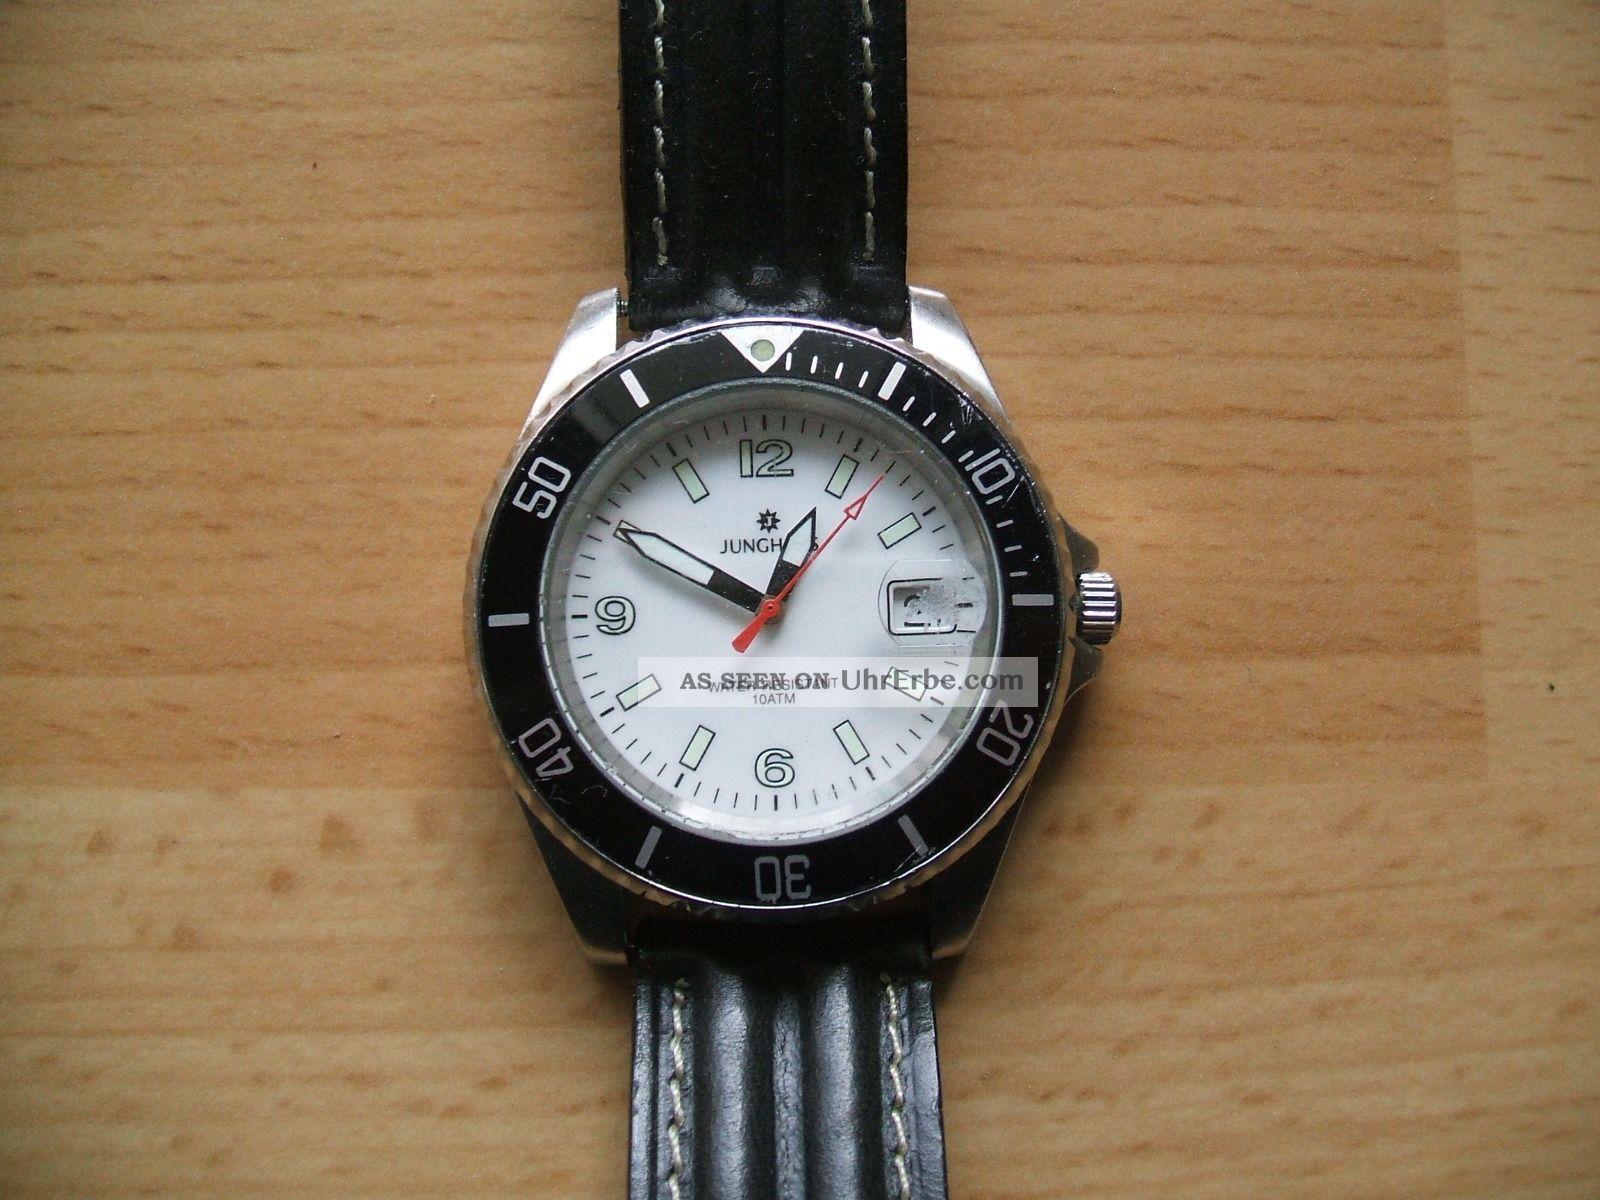 Uhr Sammlung Alte Junghans Quarz Herrenuhr 10atm Armbanduhren Bild